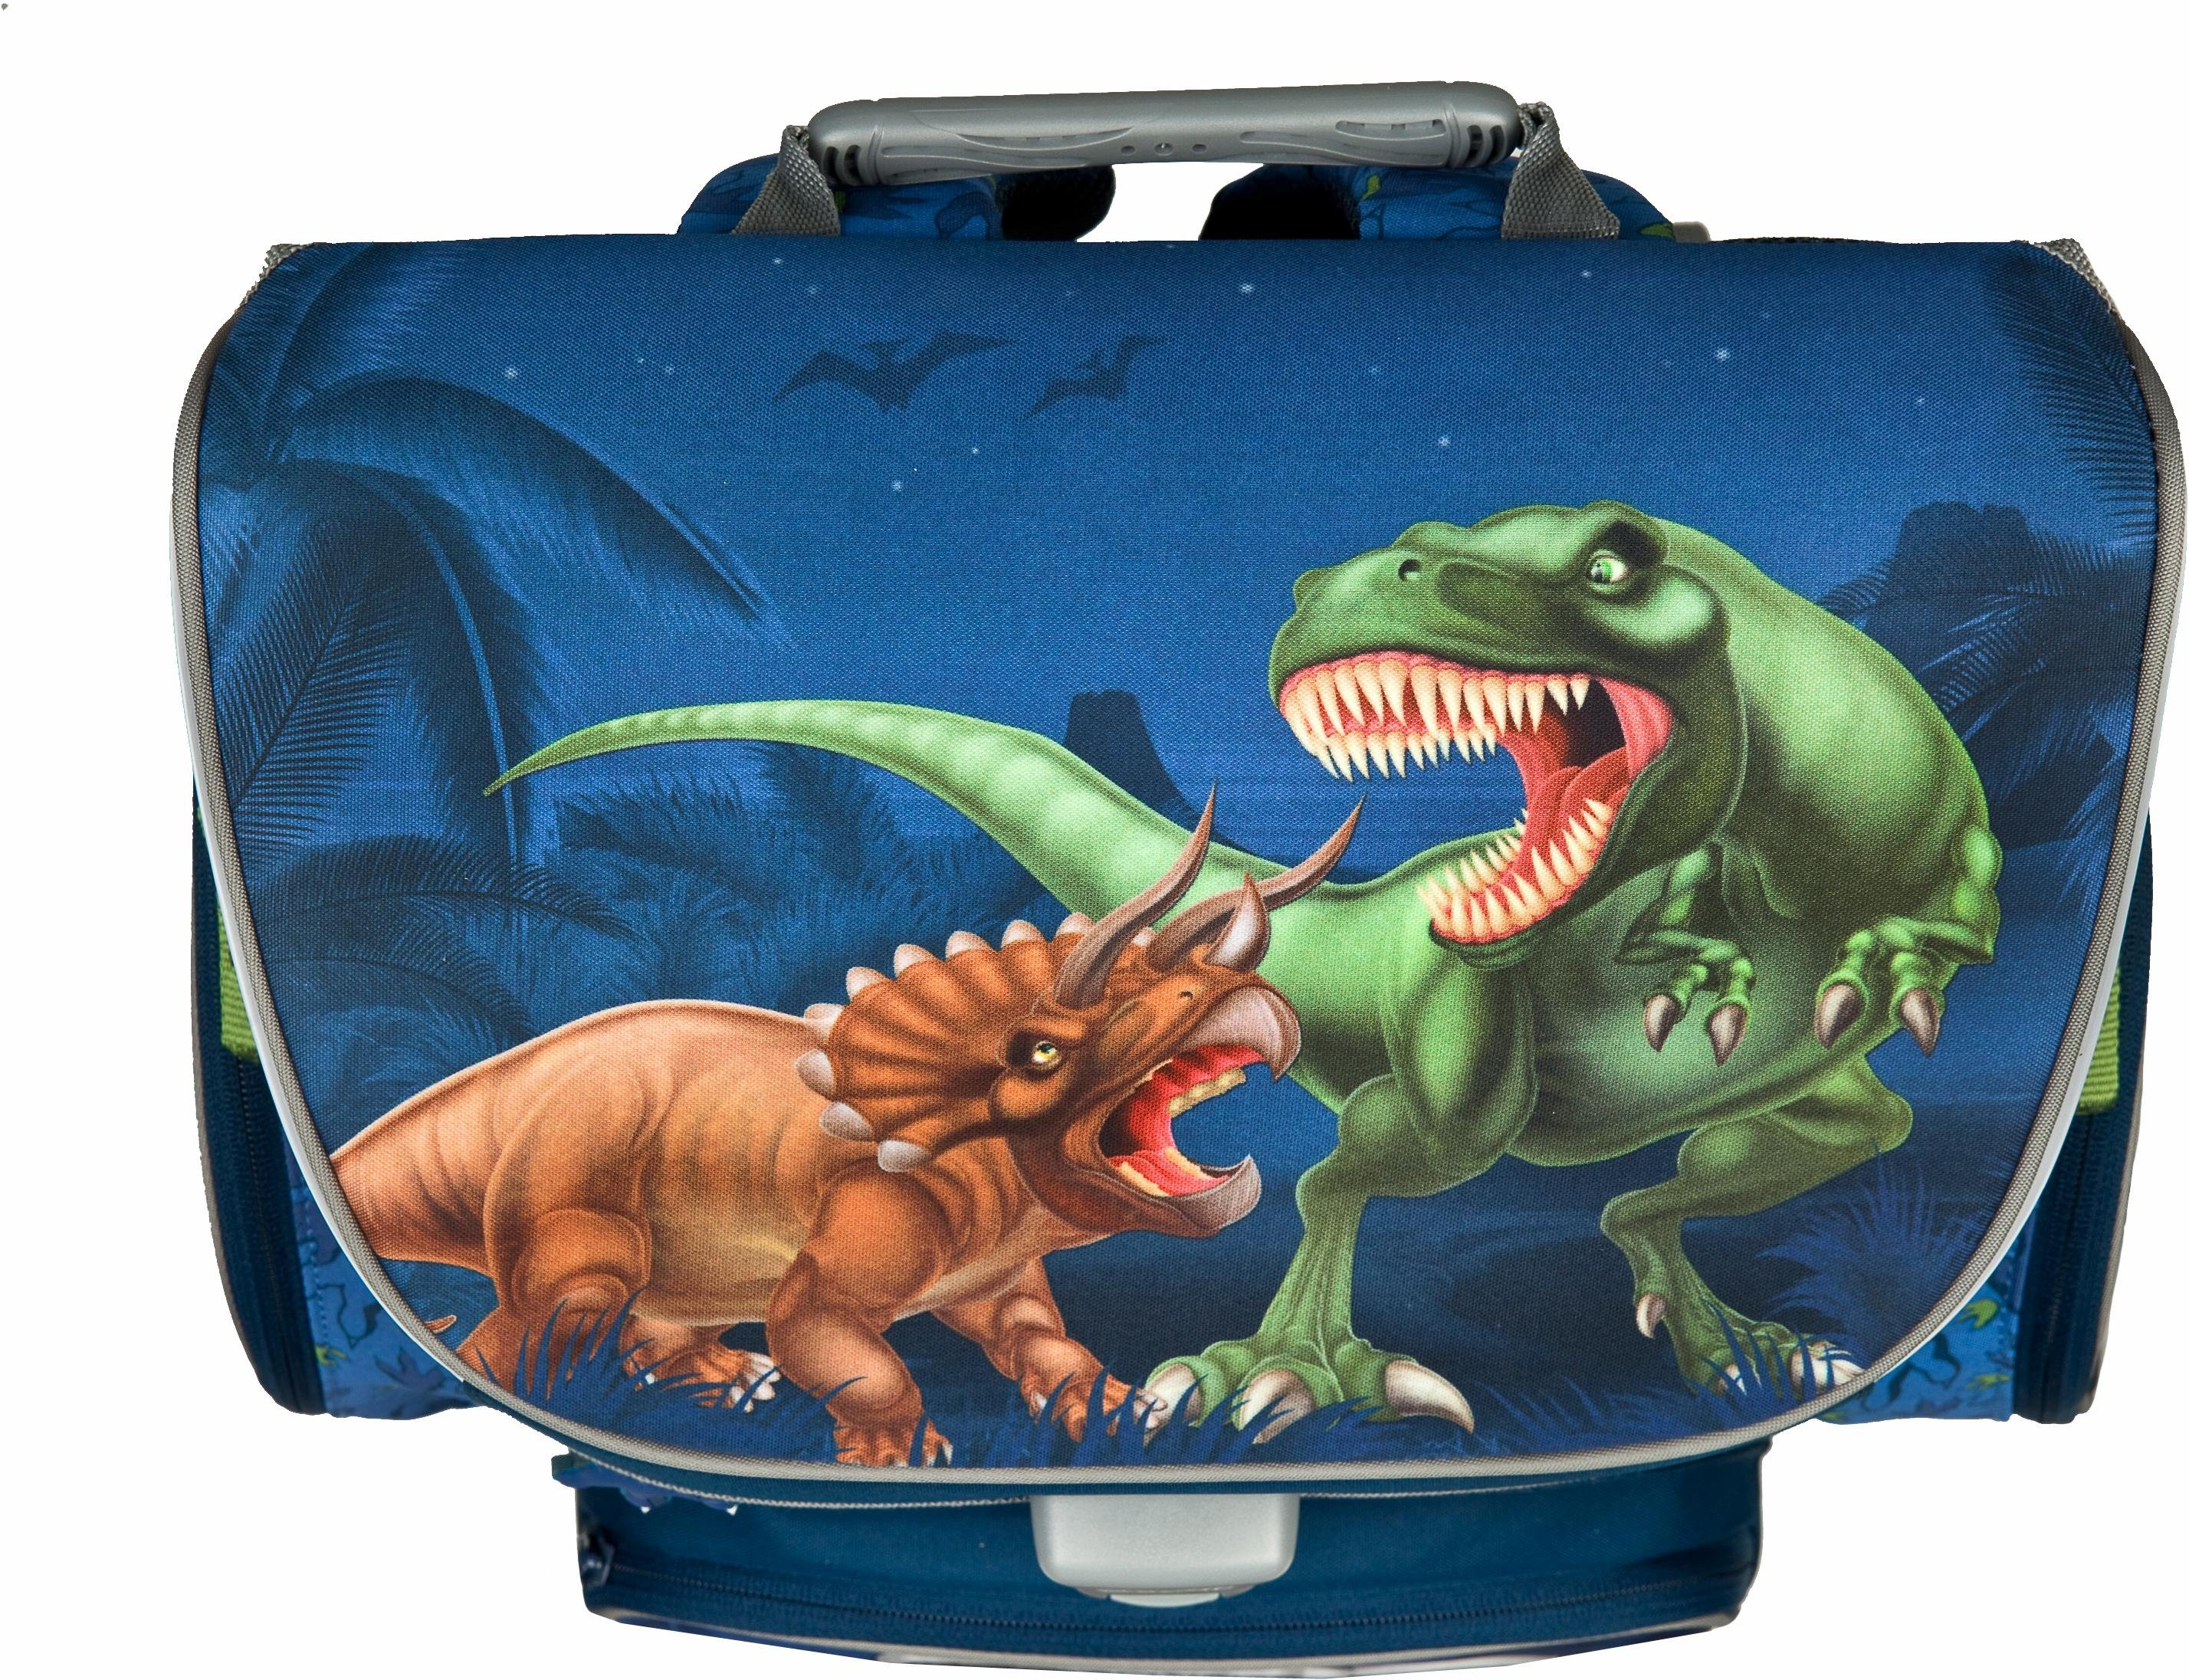 47b7d83c83a Scooli schooltas set 5-dlg., »Campus Up Dinosaurier« online ...